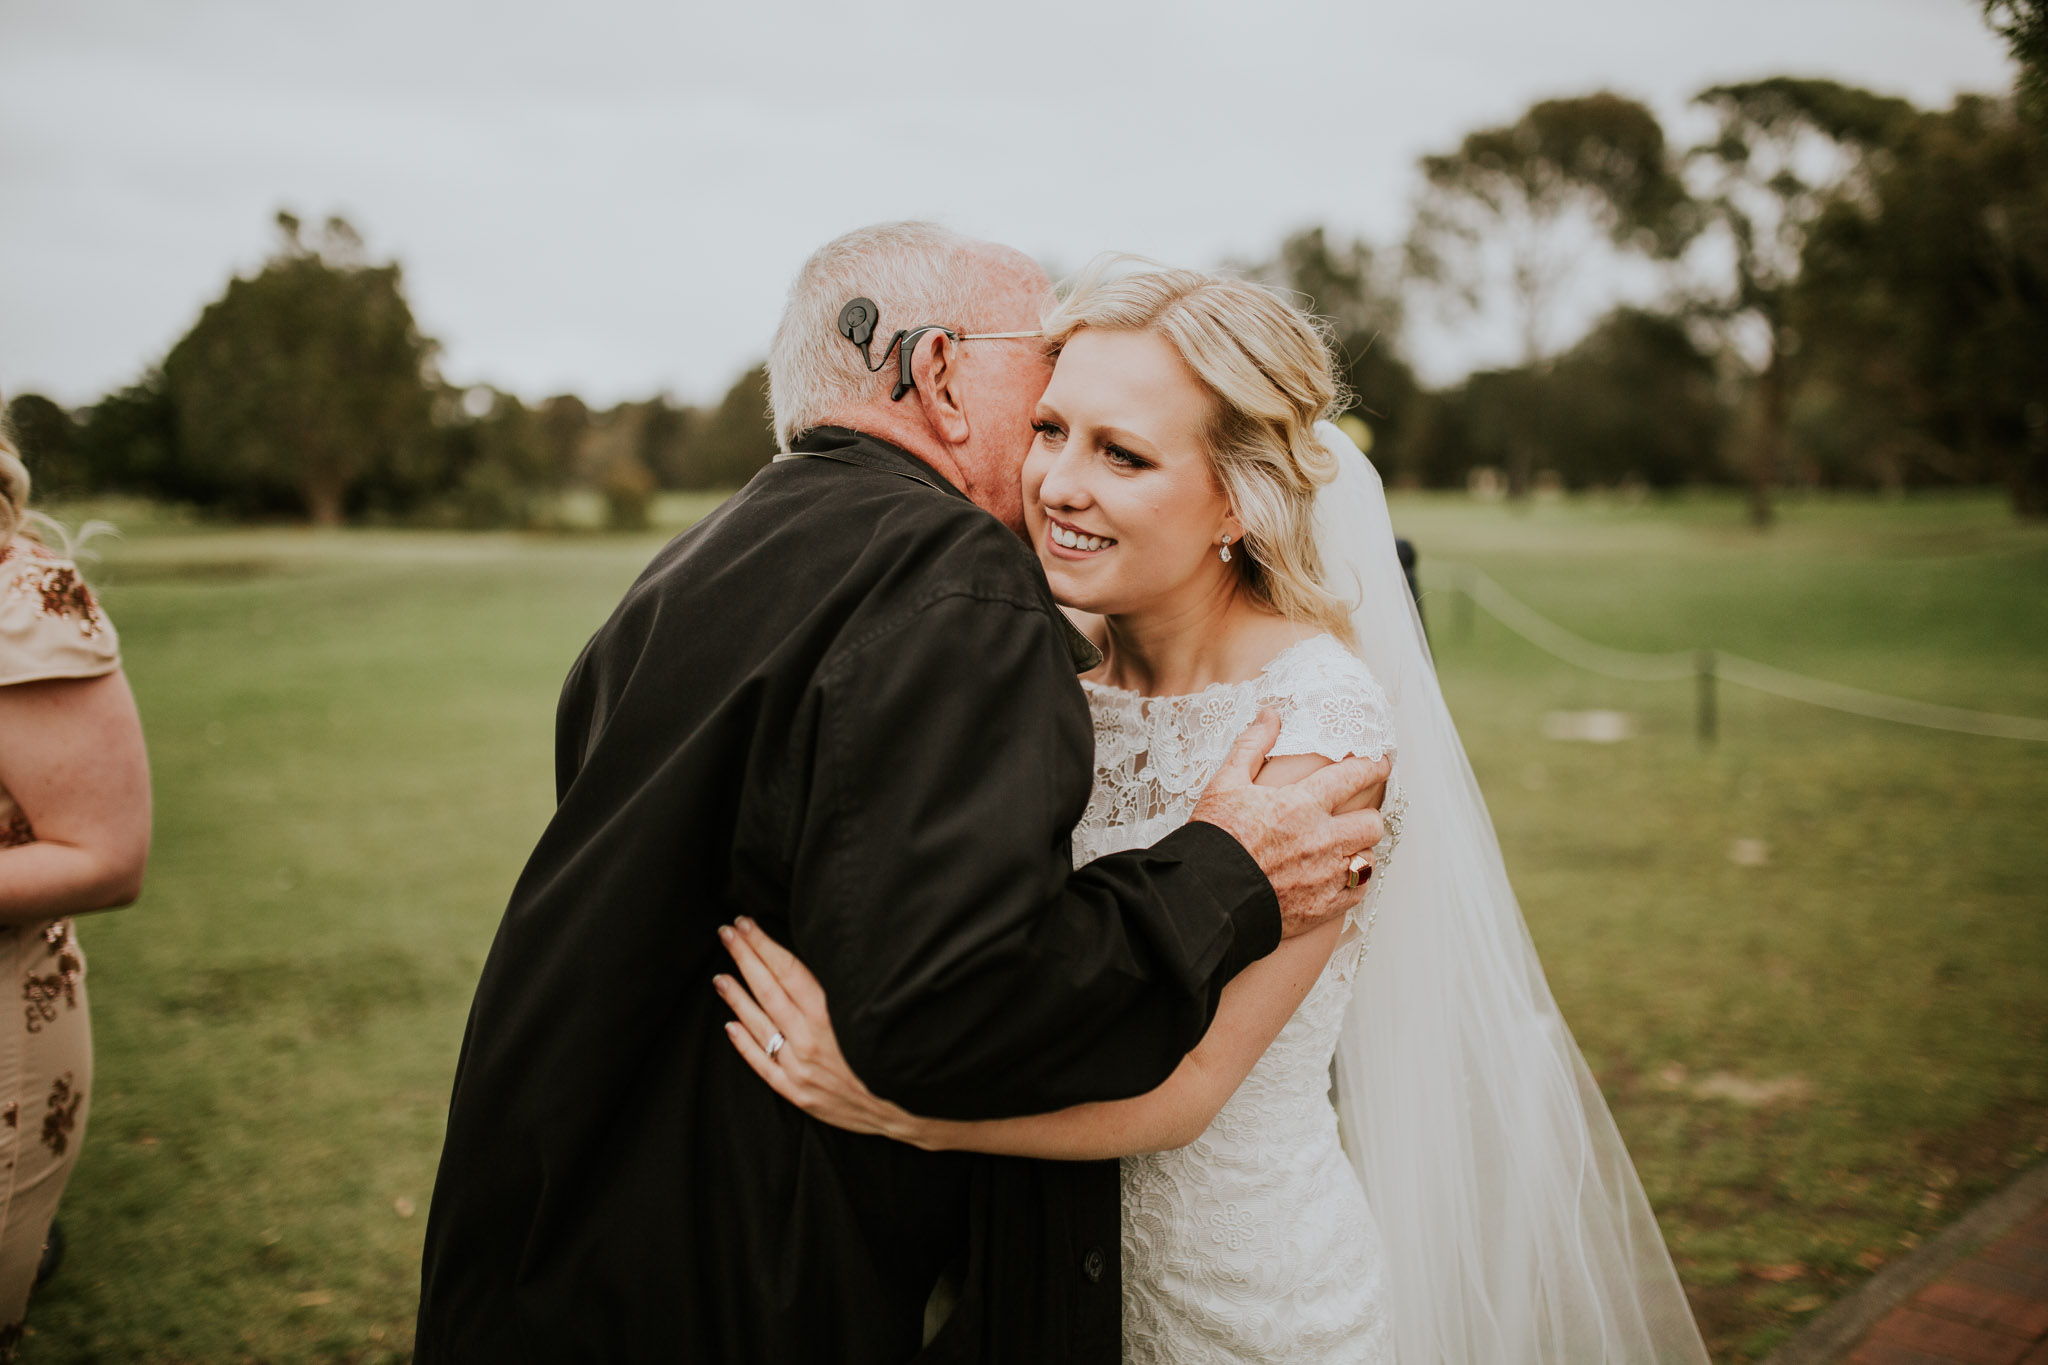 Shanan & Traci_Portkembla Golf Course Wedding-37.jpg